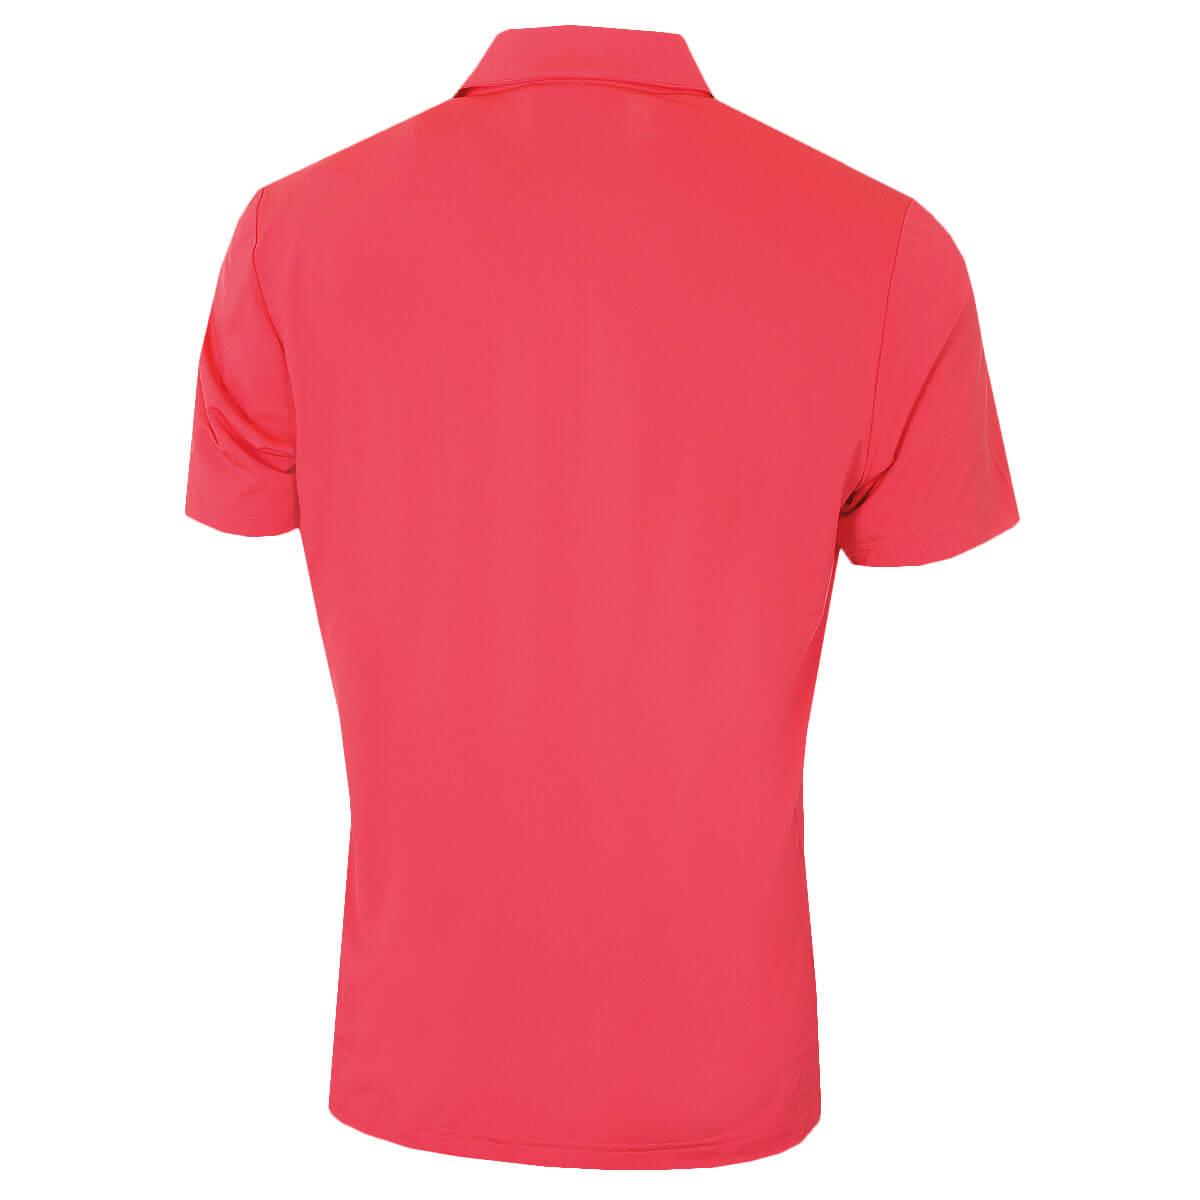 Adidas-Golf-Men-039-s-Ultimate-2-0-Solid-Crestable-Polo-Shirt thumbnail 27